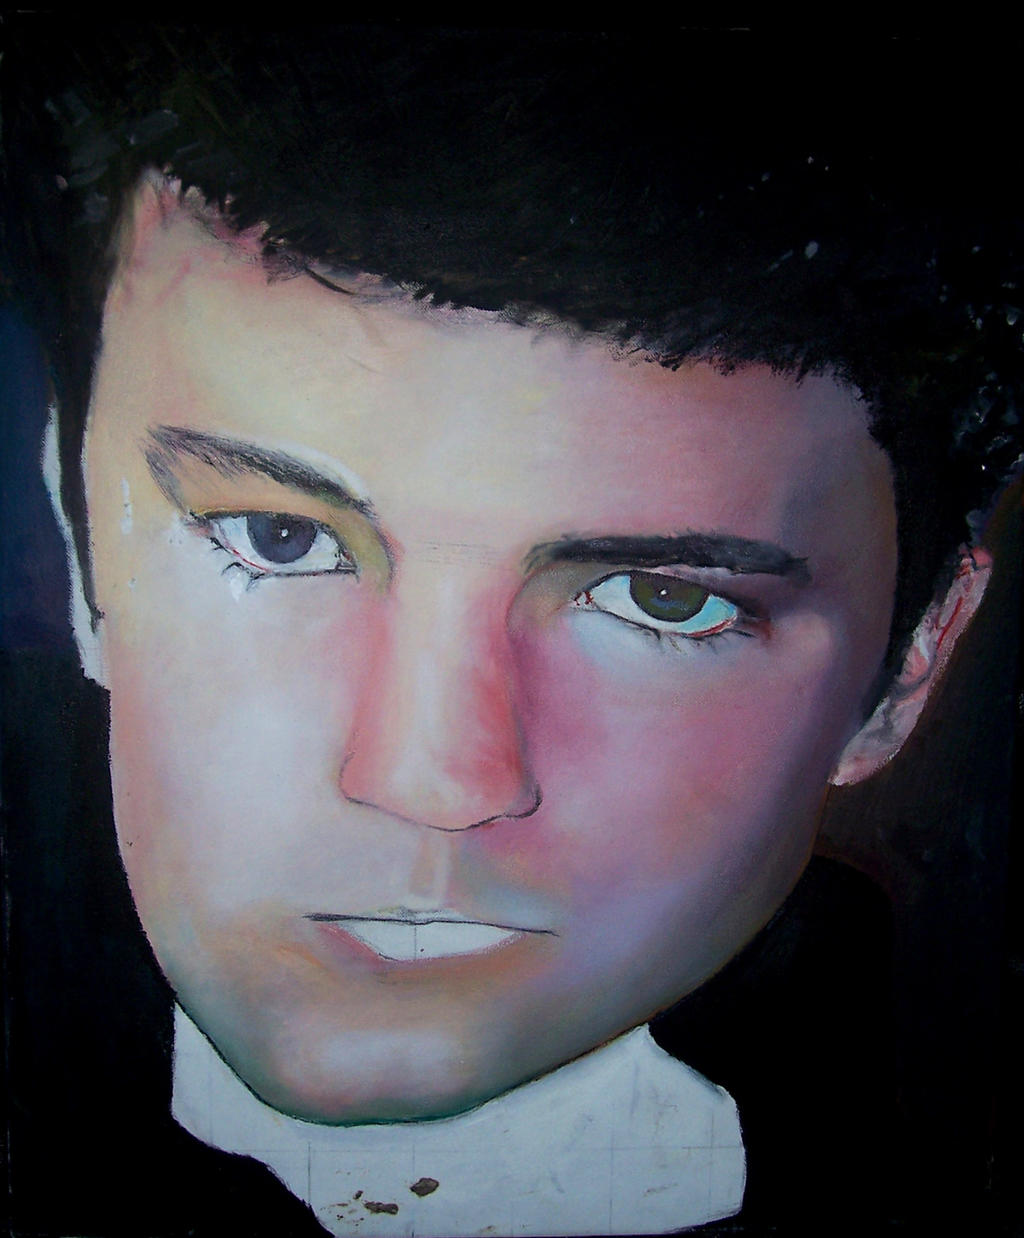 Unfinished Self Portrait by pleasenojunkthanks